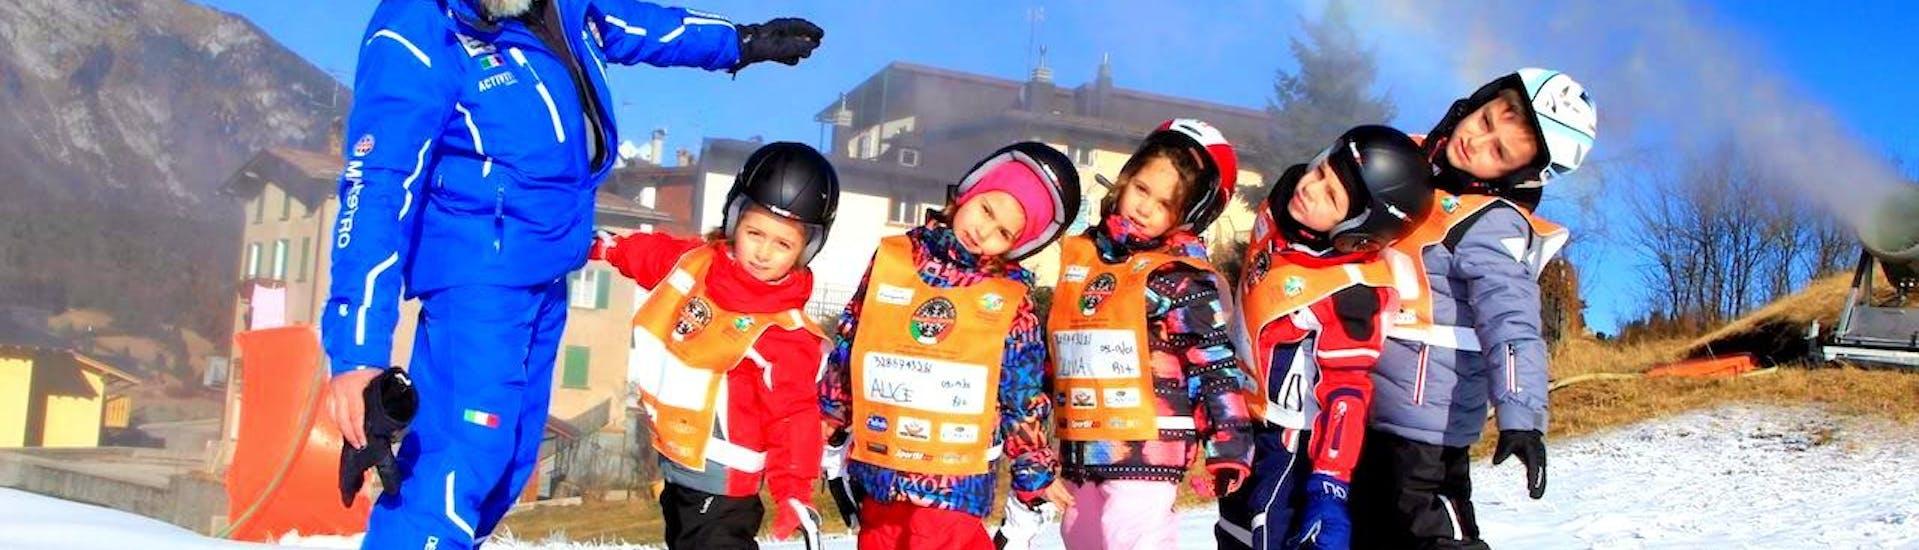 Cours de ski Enfants dès 4 ans - Premier cours avec Scuola di Sci Andalo Dolomiti di Brenta - Hero image